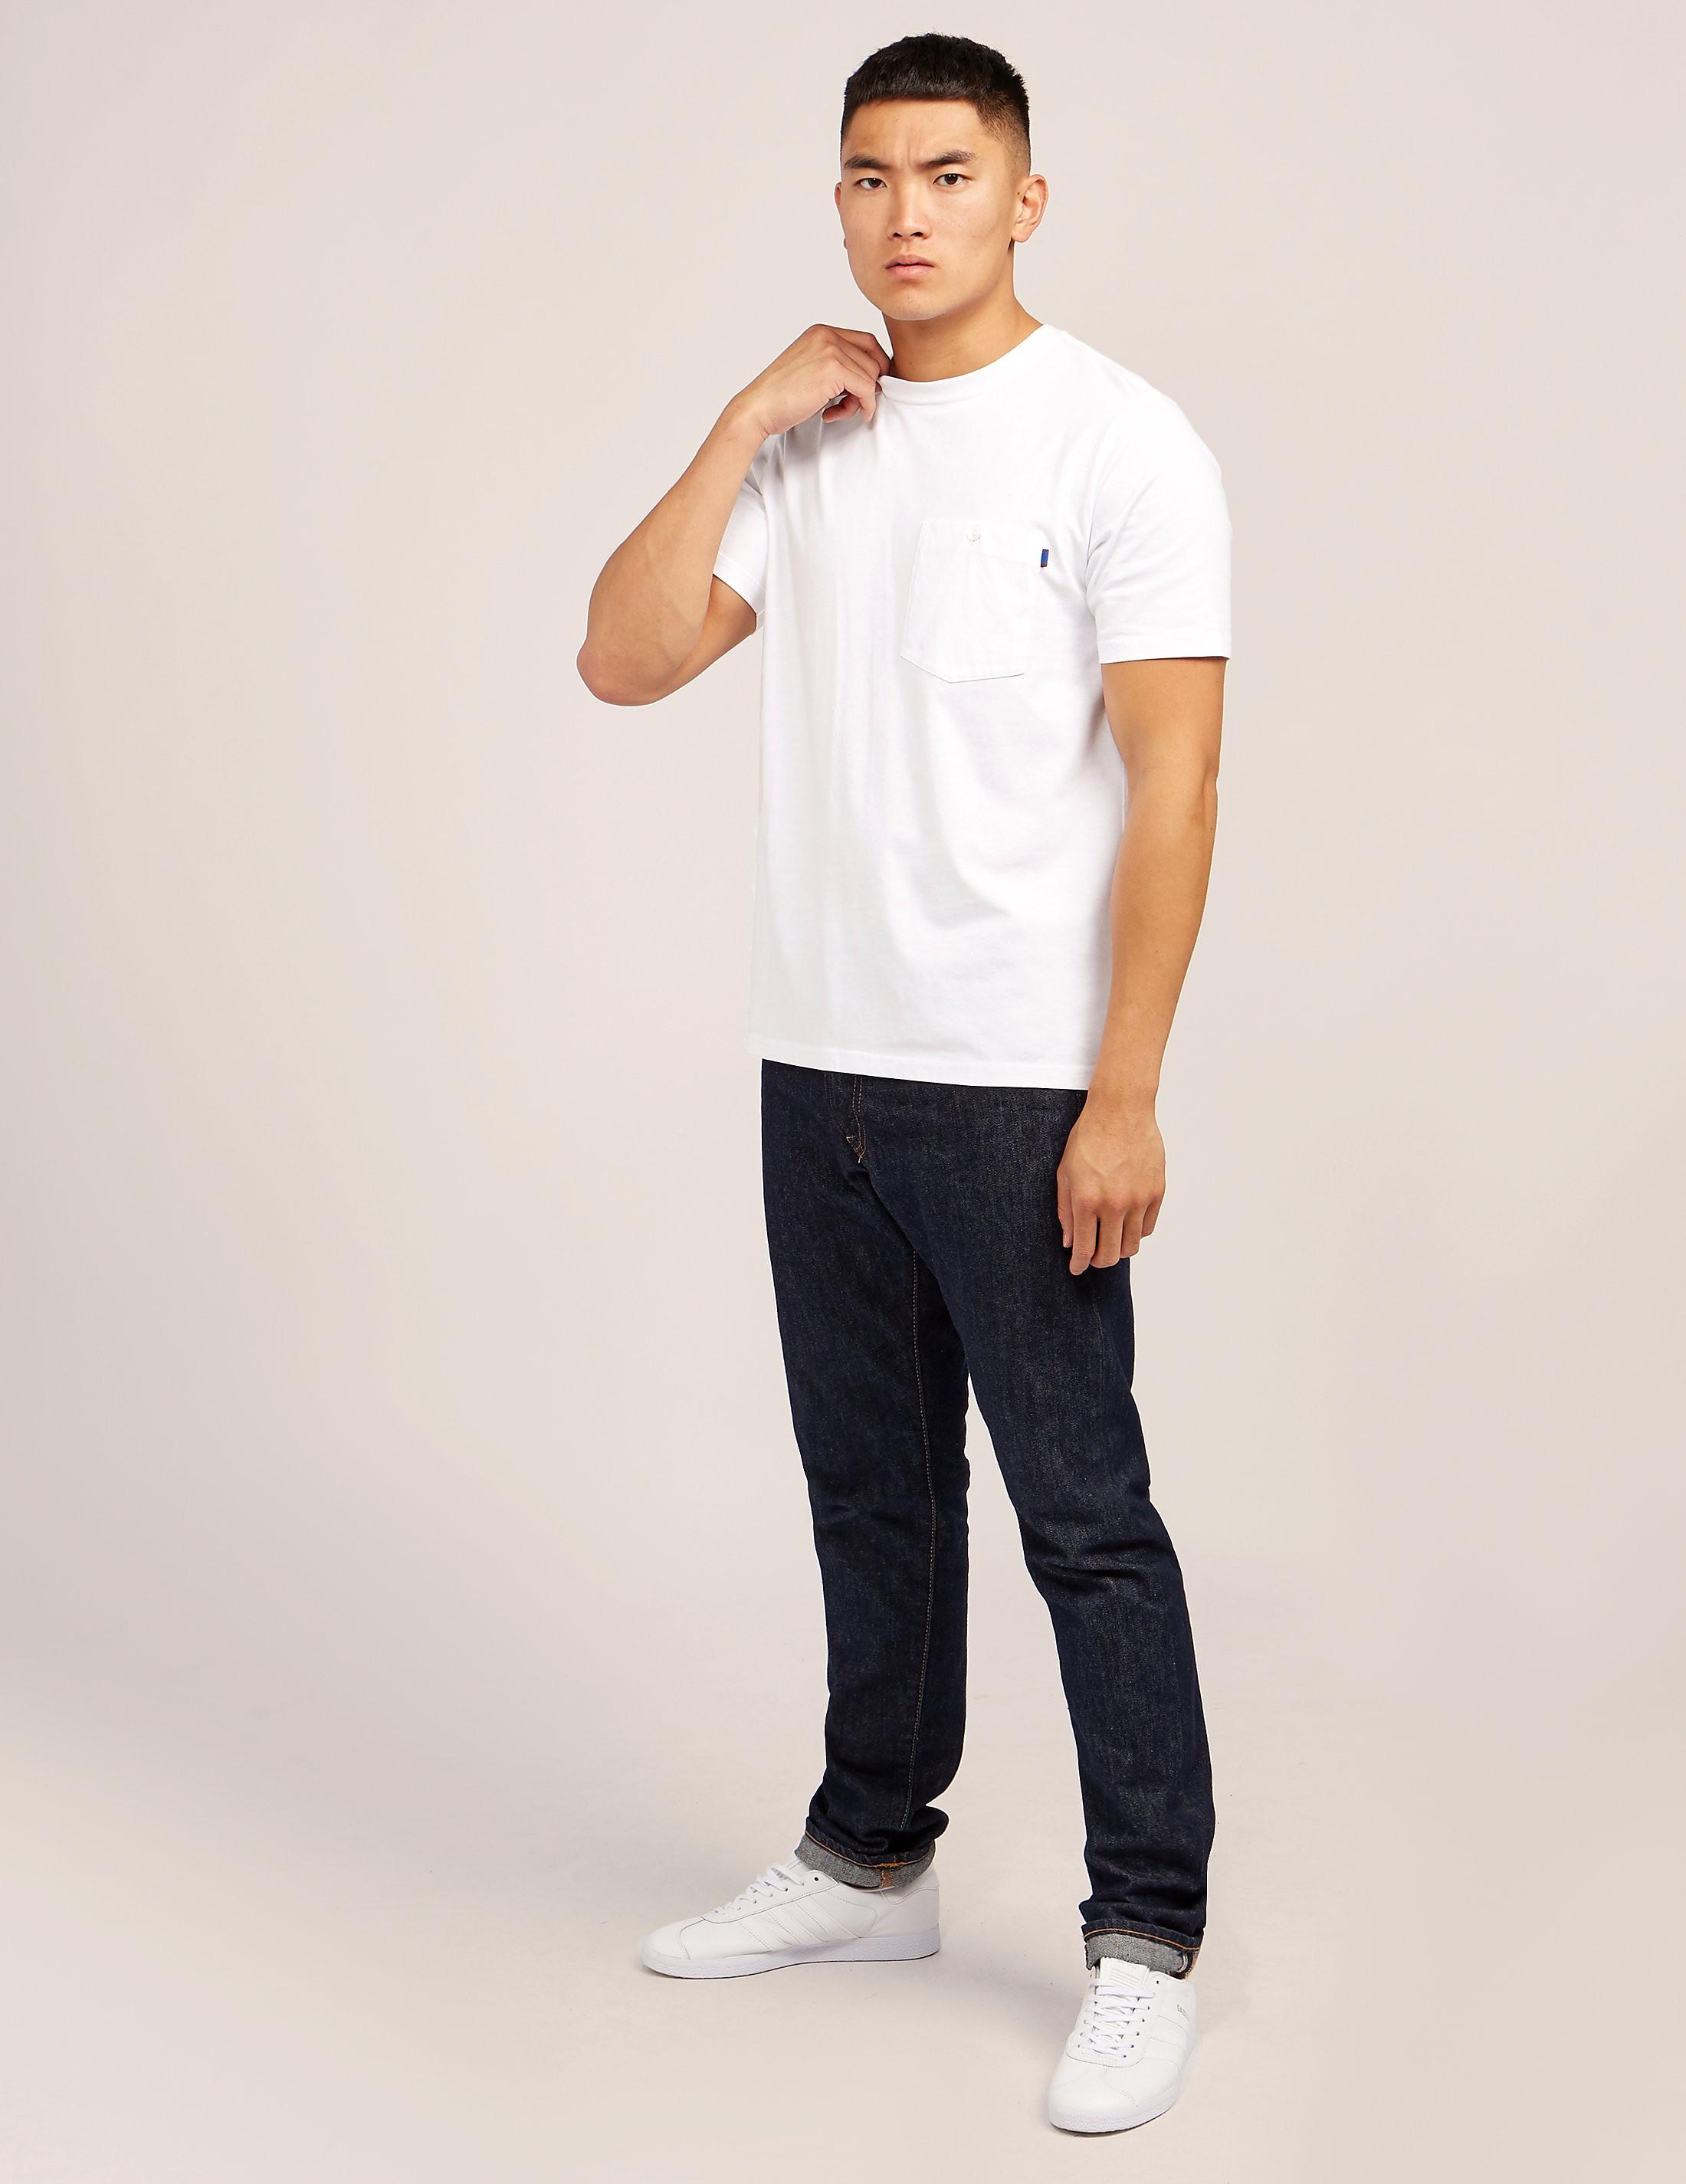 Paul Smith Pocket Short Sleeve T-Shirt